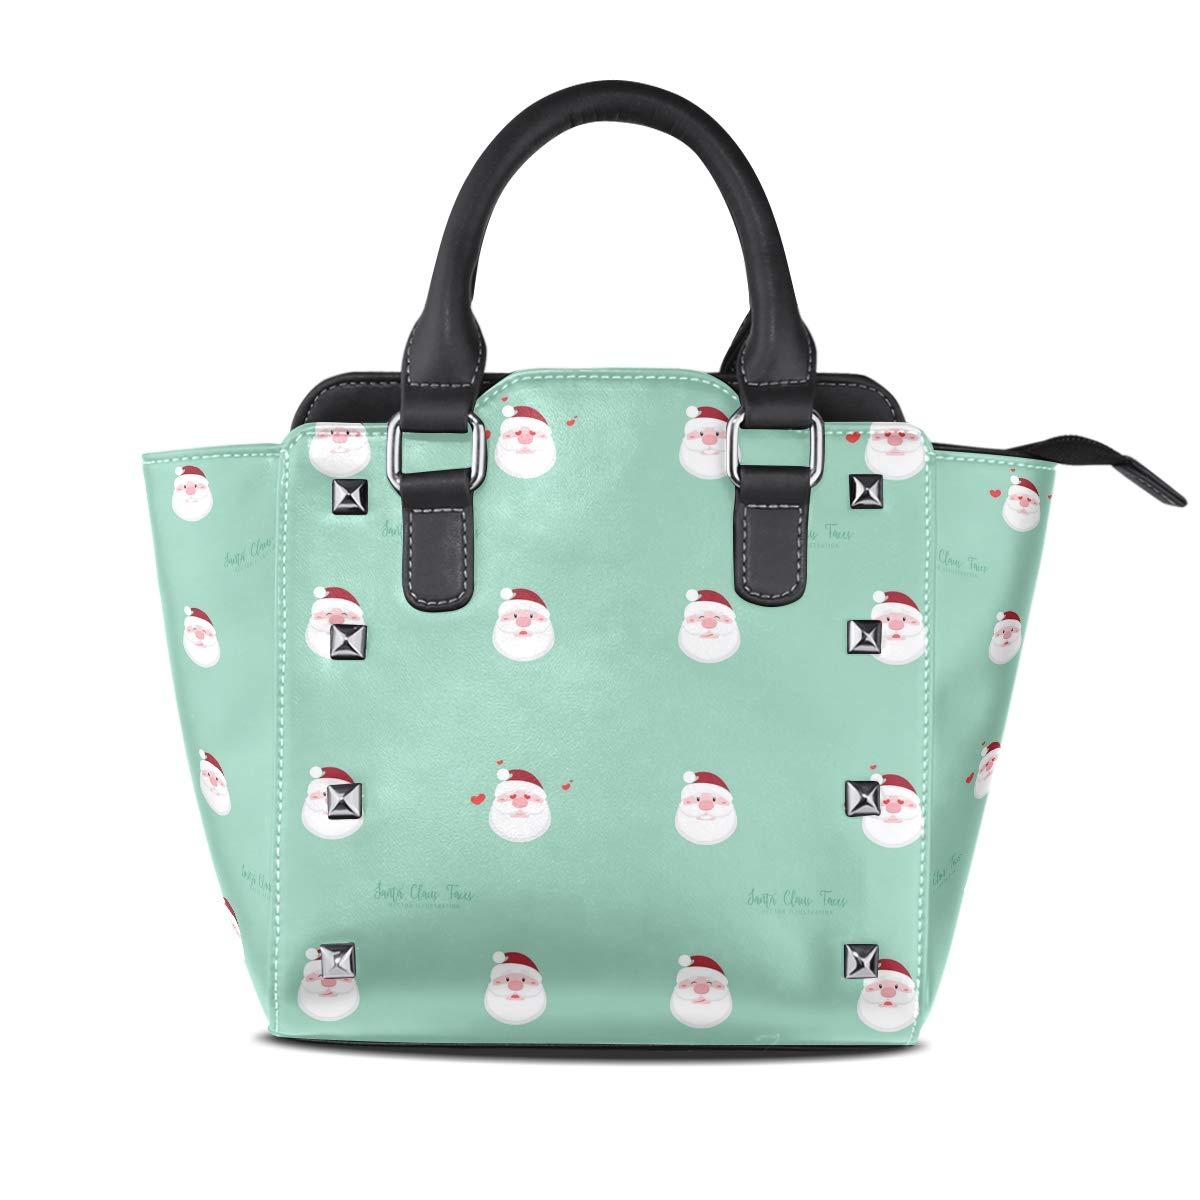 Cute And Dear Santa Claus Women Top Handle Satchel Handbags Shoulder Bag Tote Purse Messenger Bags